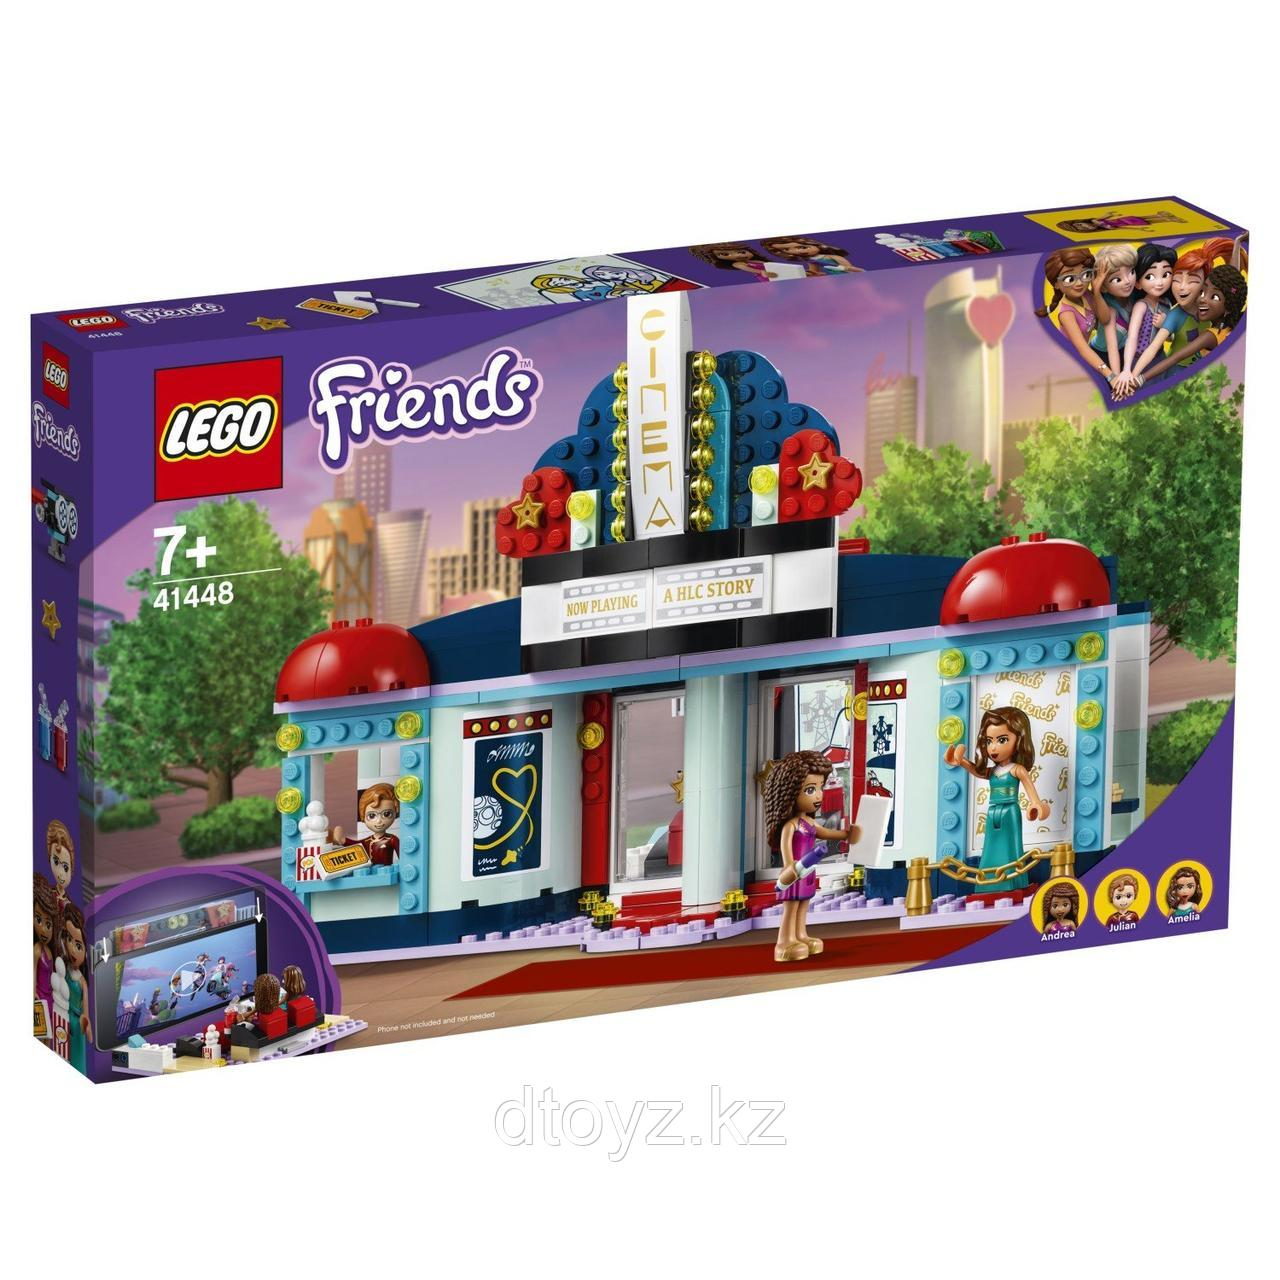 Lego Friends Кинотеатр Хартлейк-Сити 41448